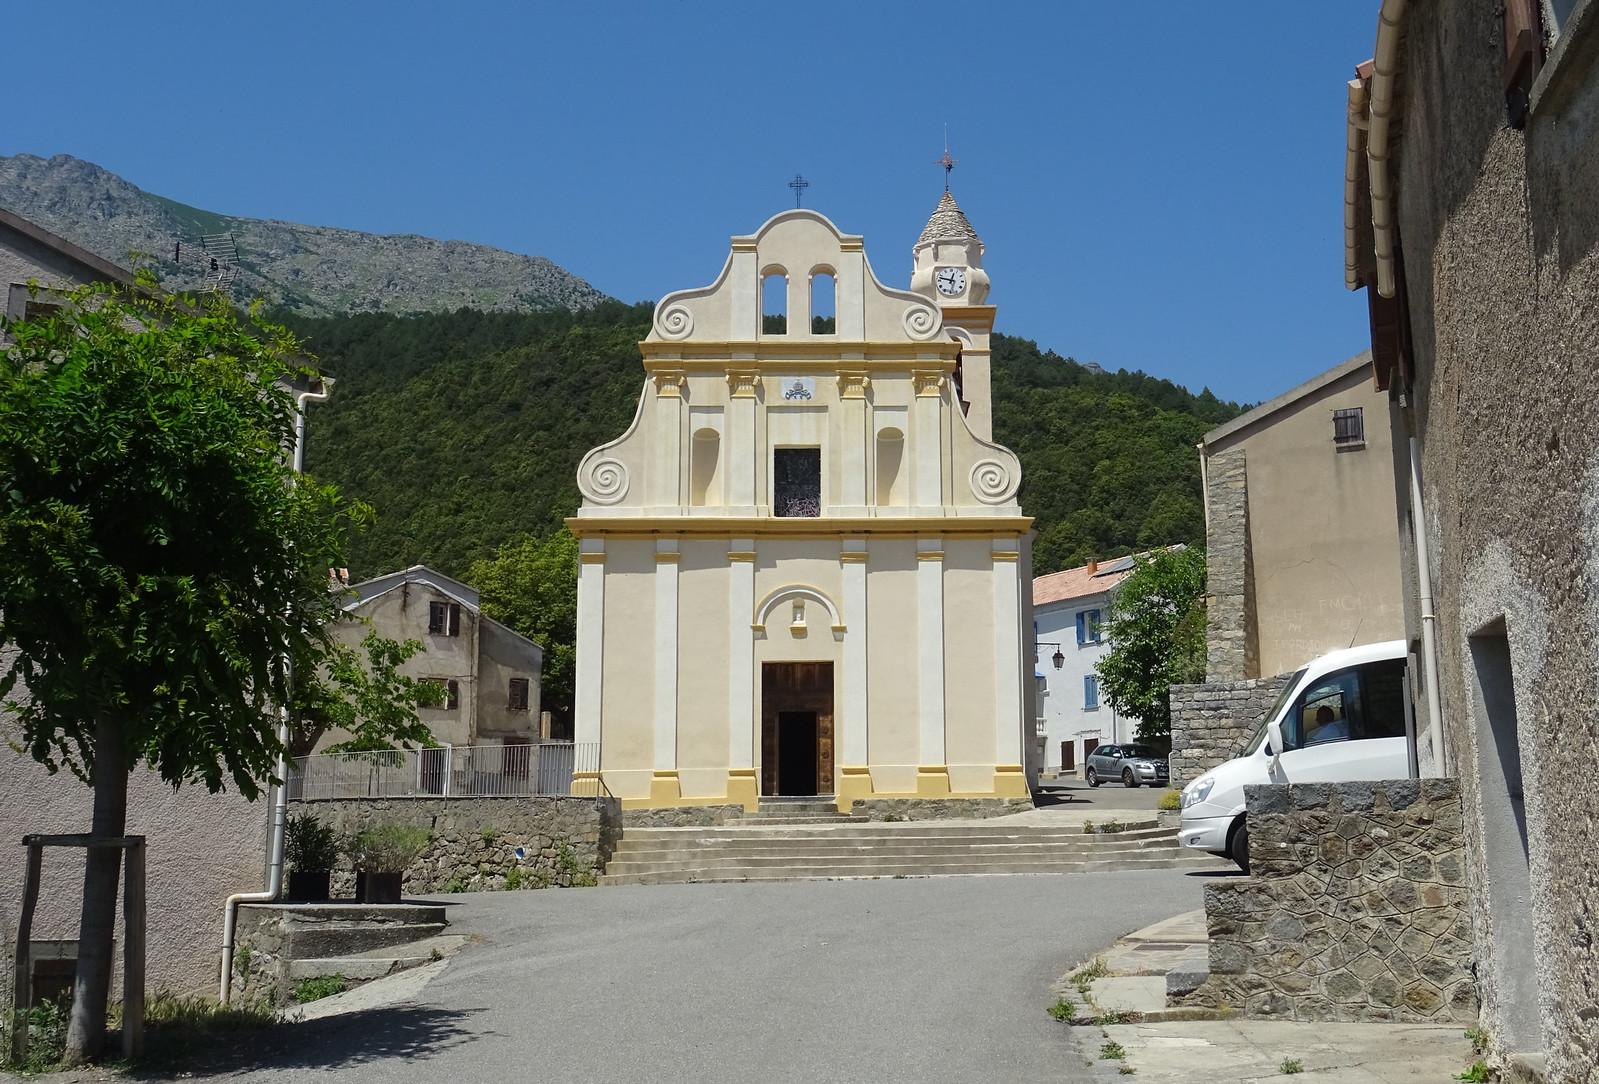 Santo-Pietro-di-Venaco